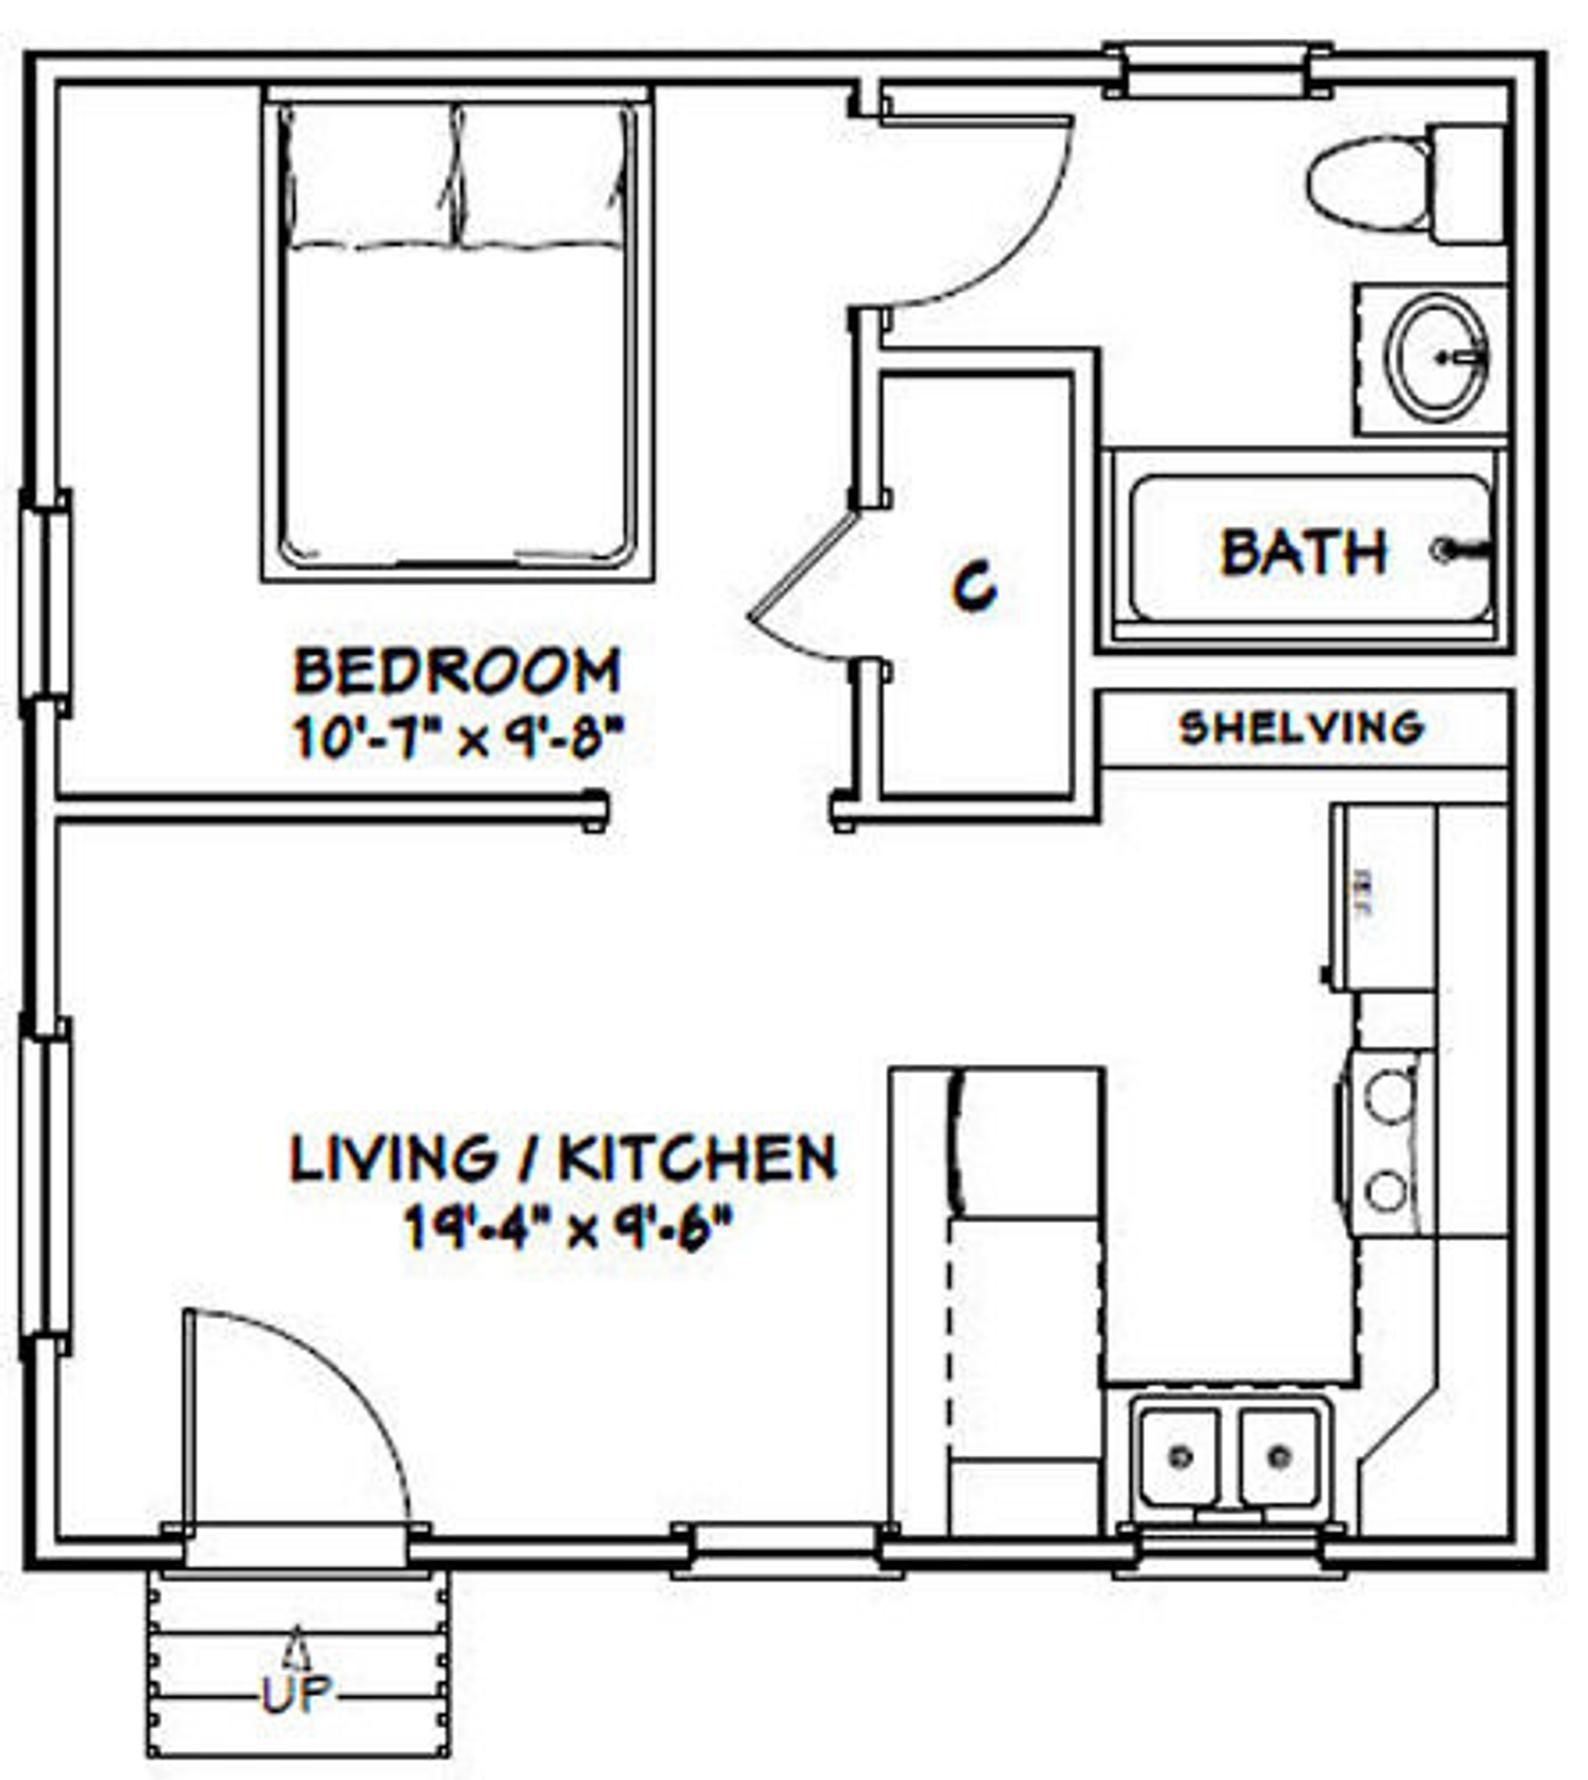 20x20 Tiny House 1Bedroom 1Bath 400 sq ft PDF